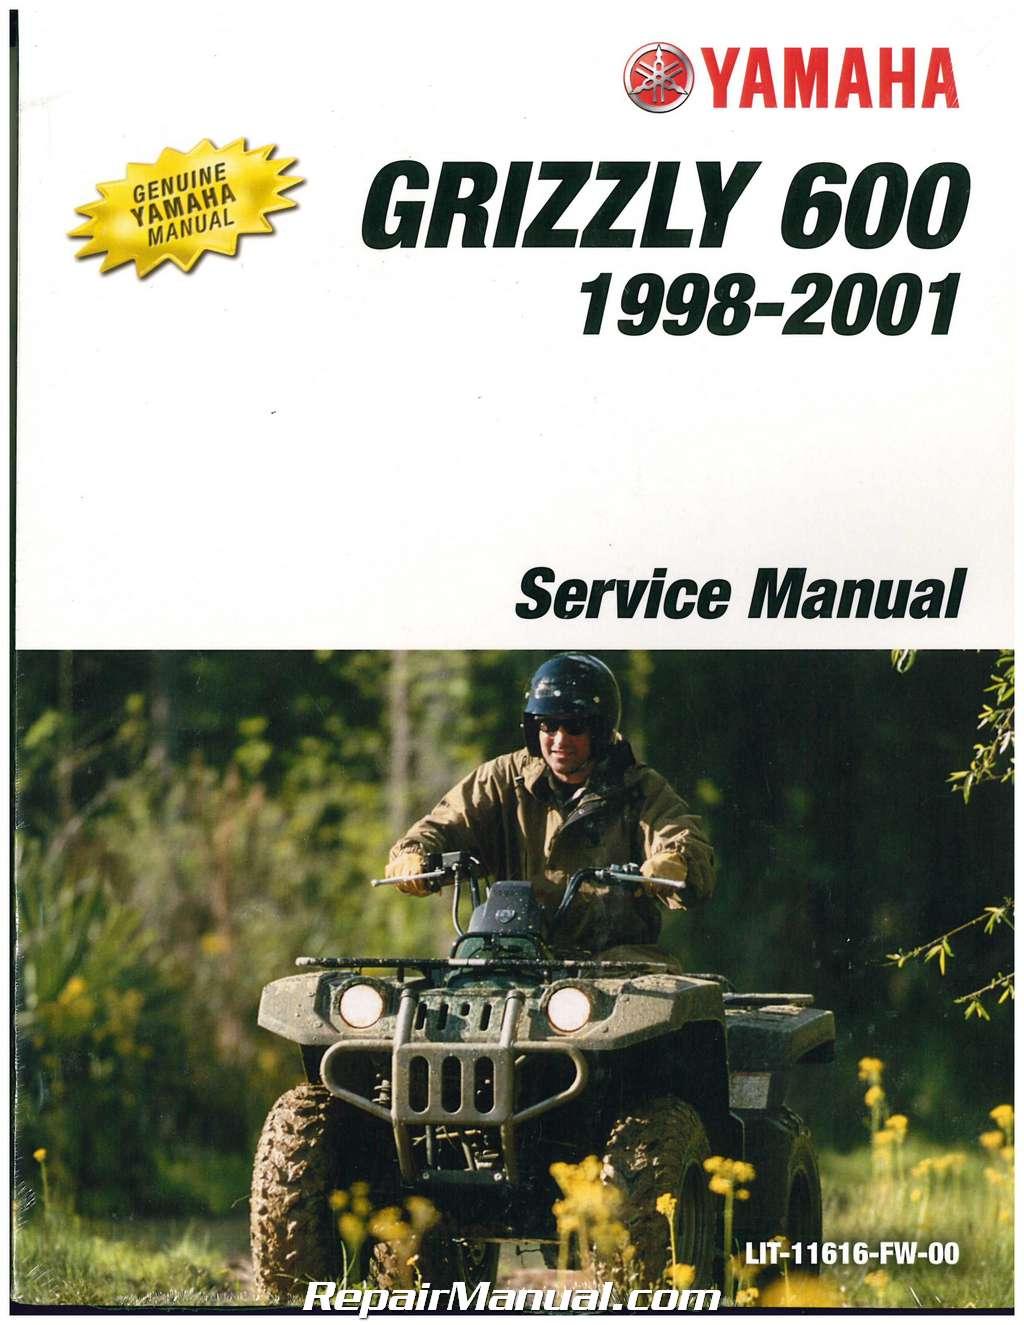 1998 2001 yamaha yfm600 grizzly atv service manual lit 11616 fw 00 rh ebay com YFM Radio Kitai Kaya FM